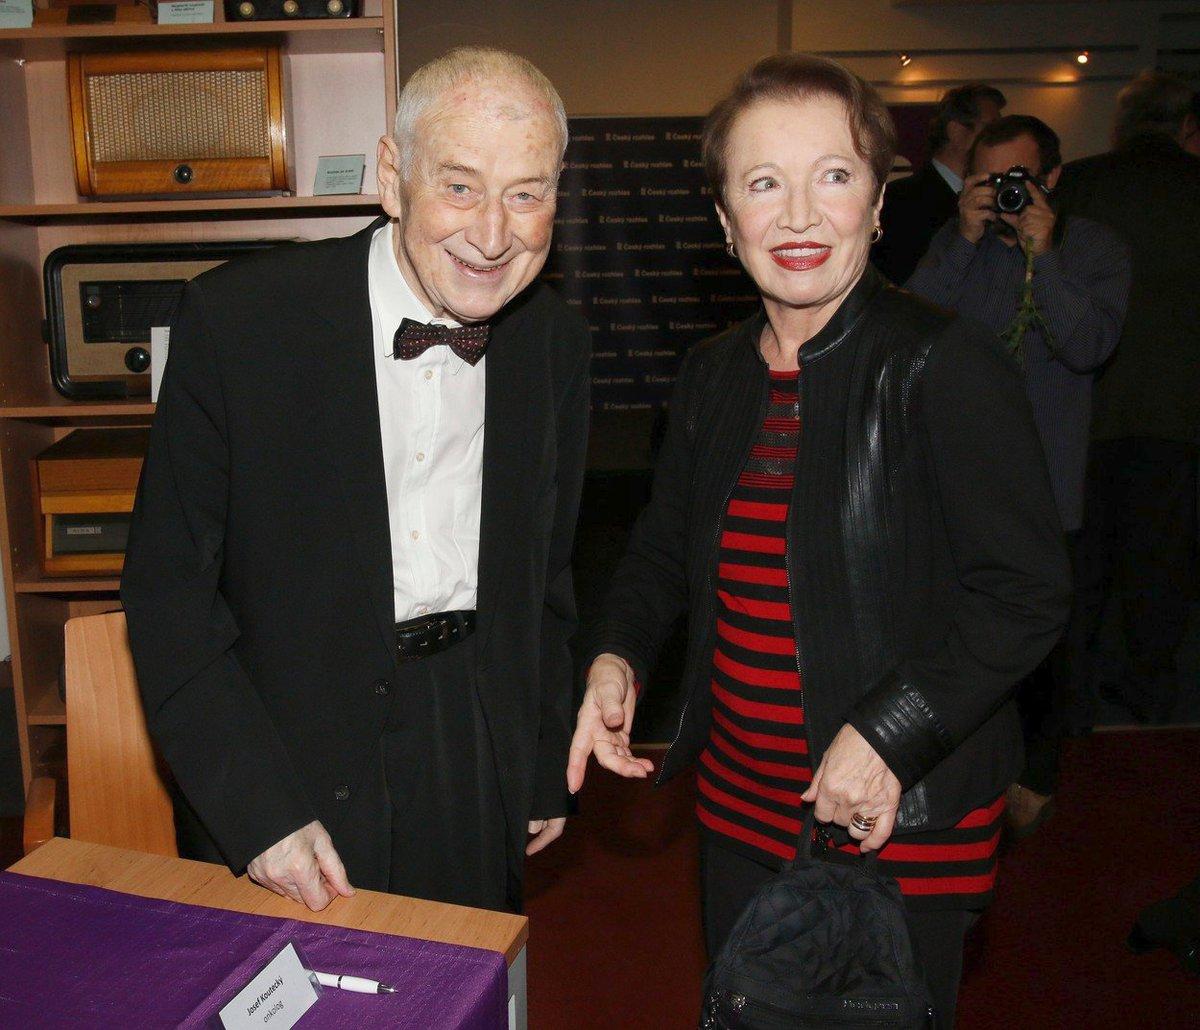 Profesor Josef Koutecký s herečkou Hanou Maciuchovou v roce 2017.